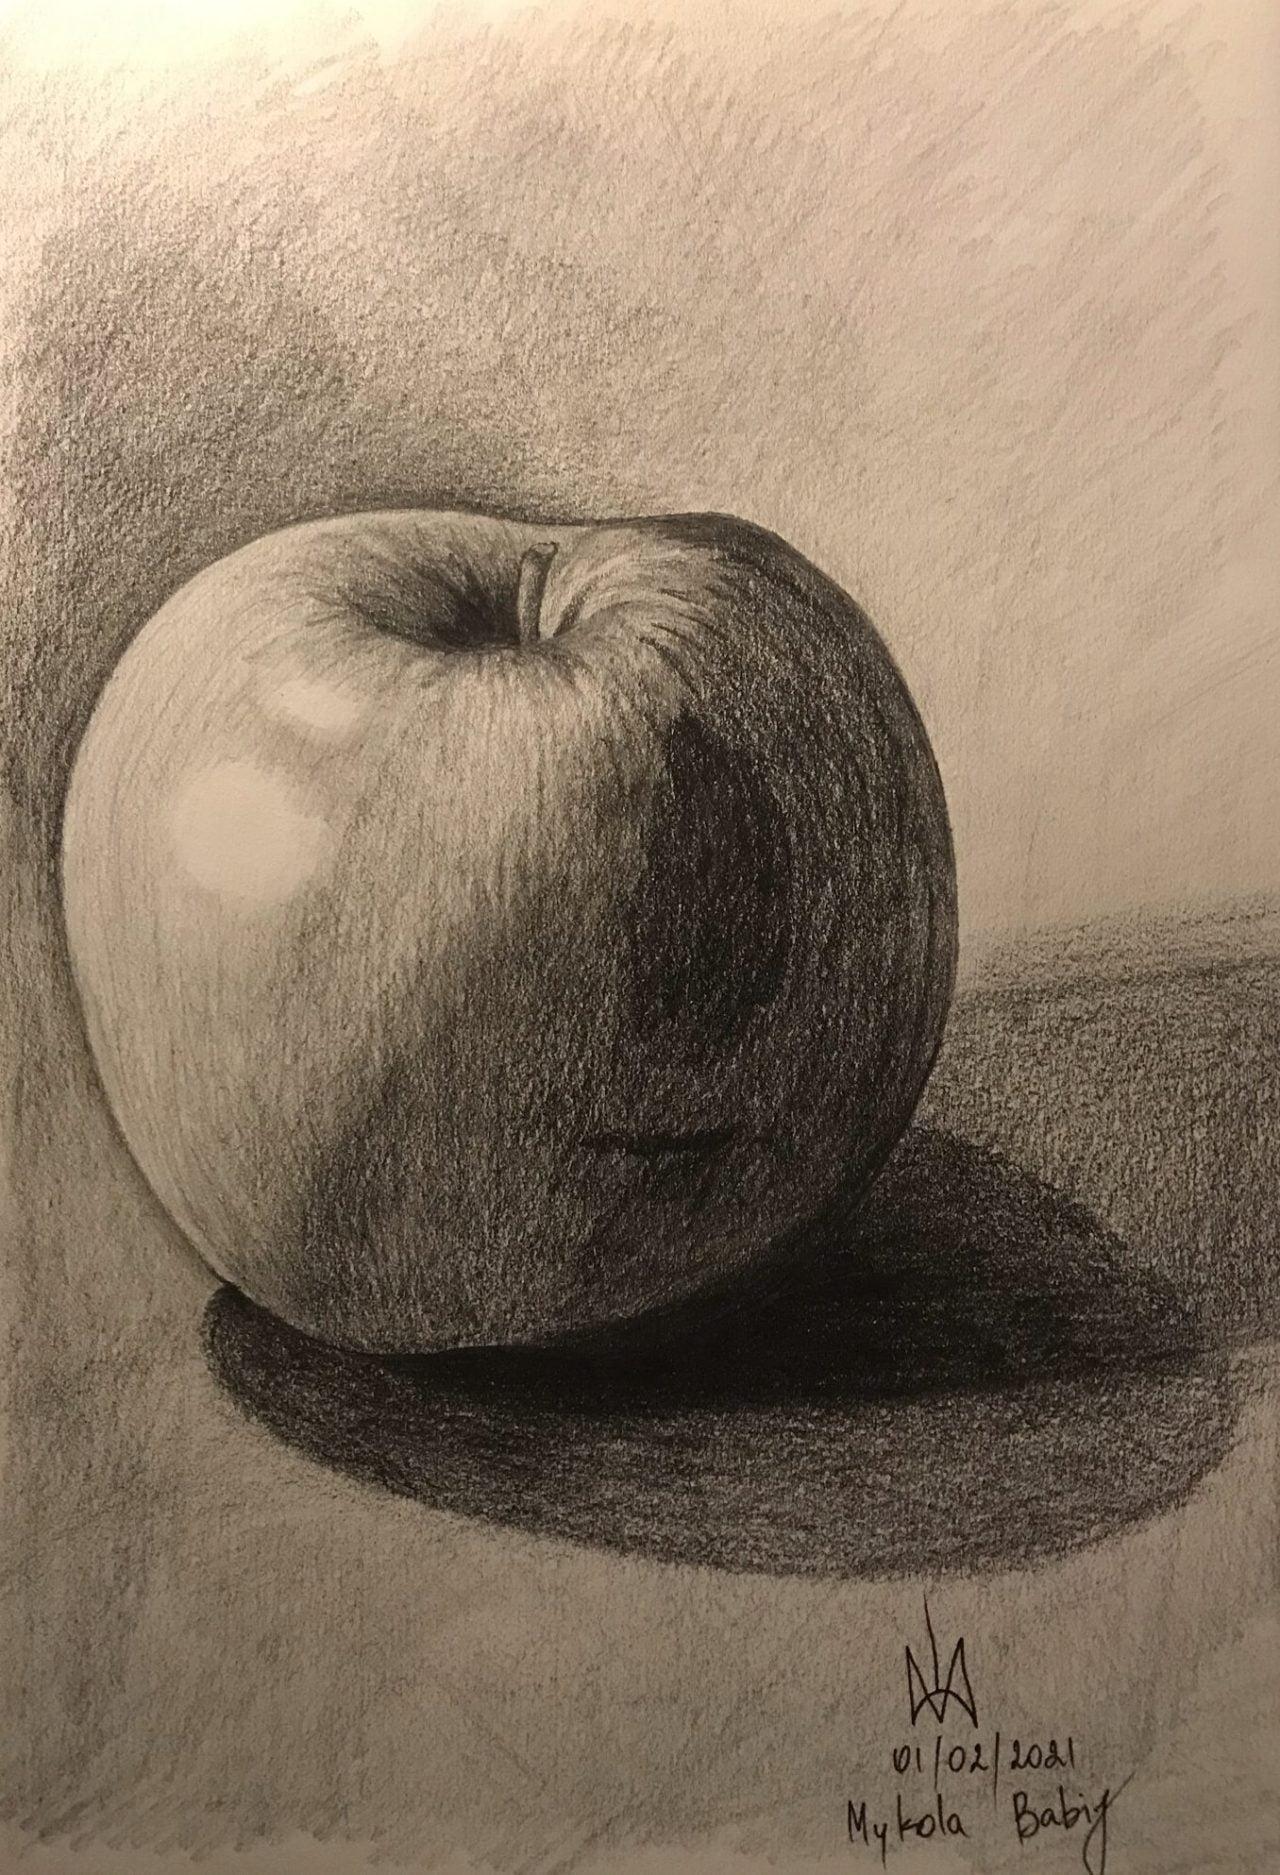 Apple. Pencil drawing